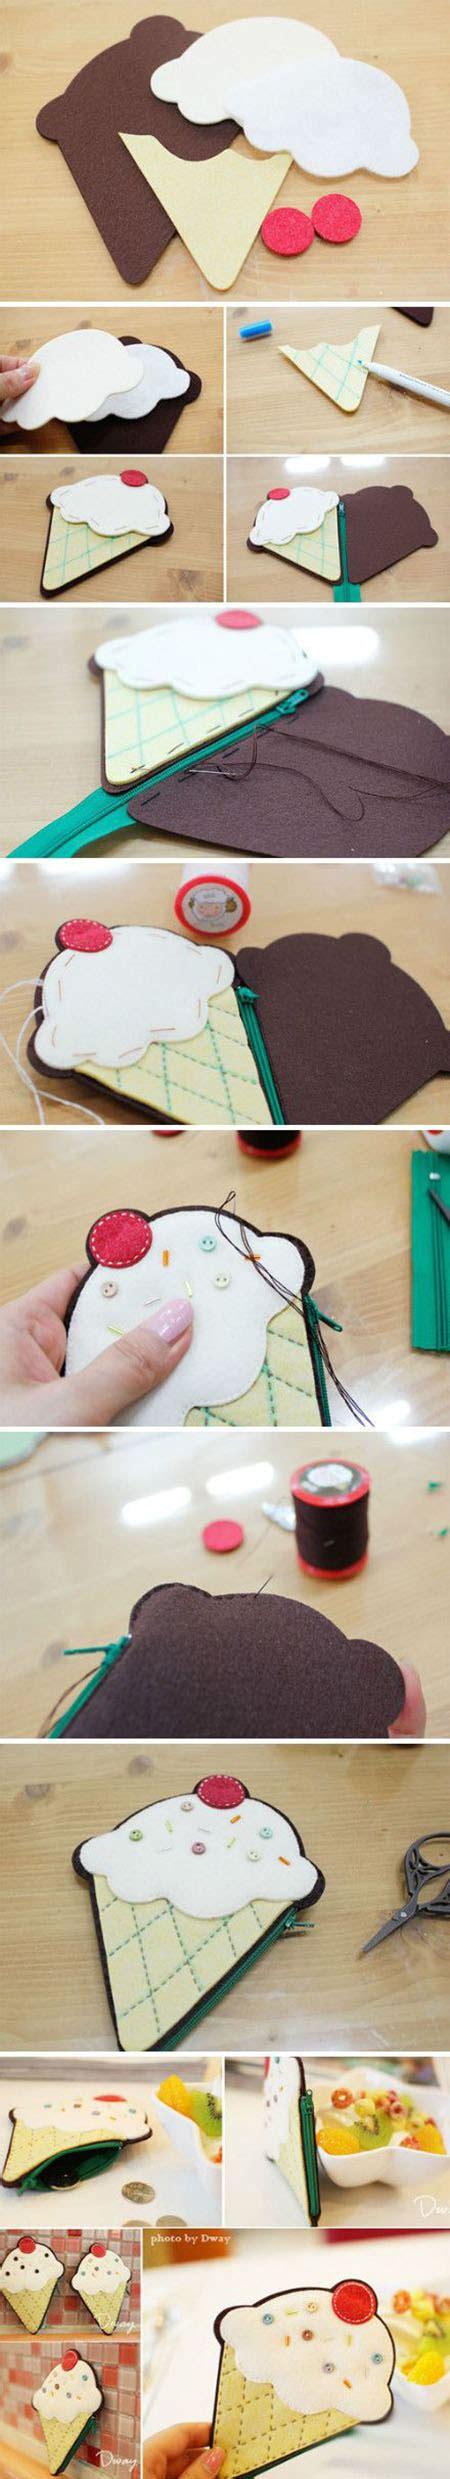 felt ice cream purse  tutorials